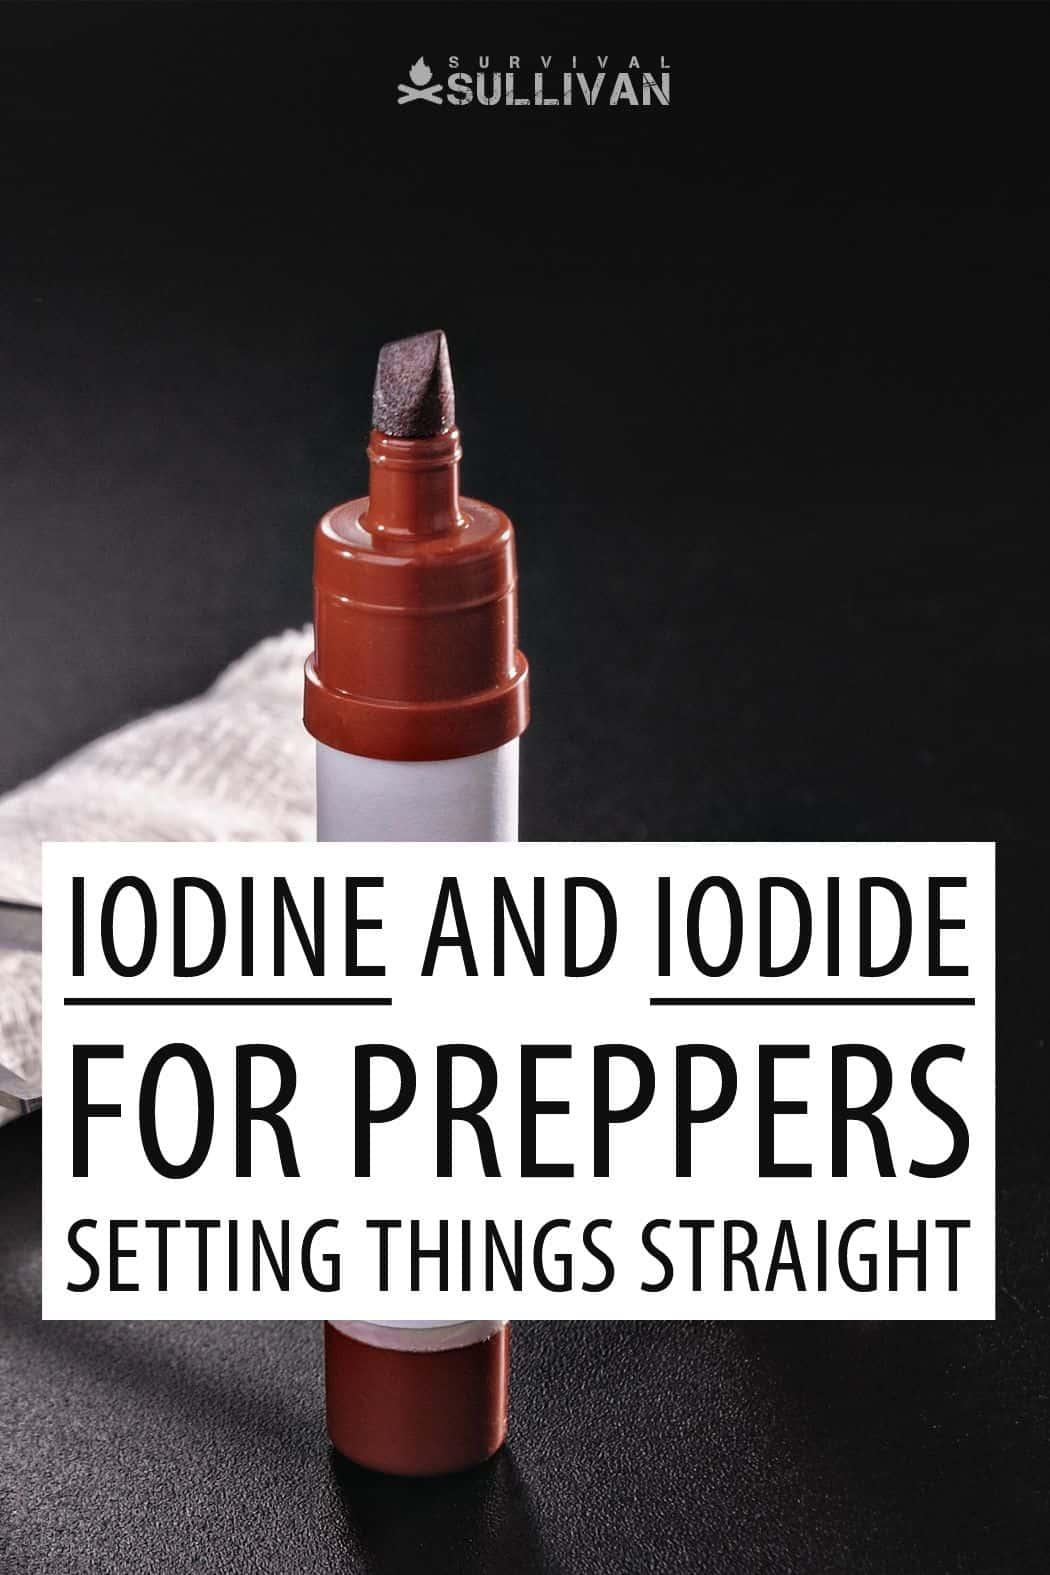 iodine vs. iodide Pinterest image